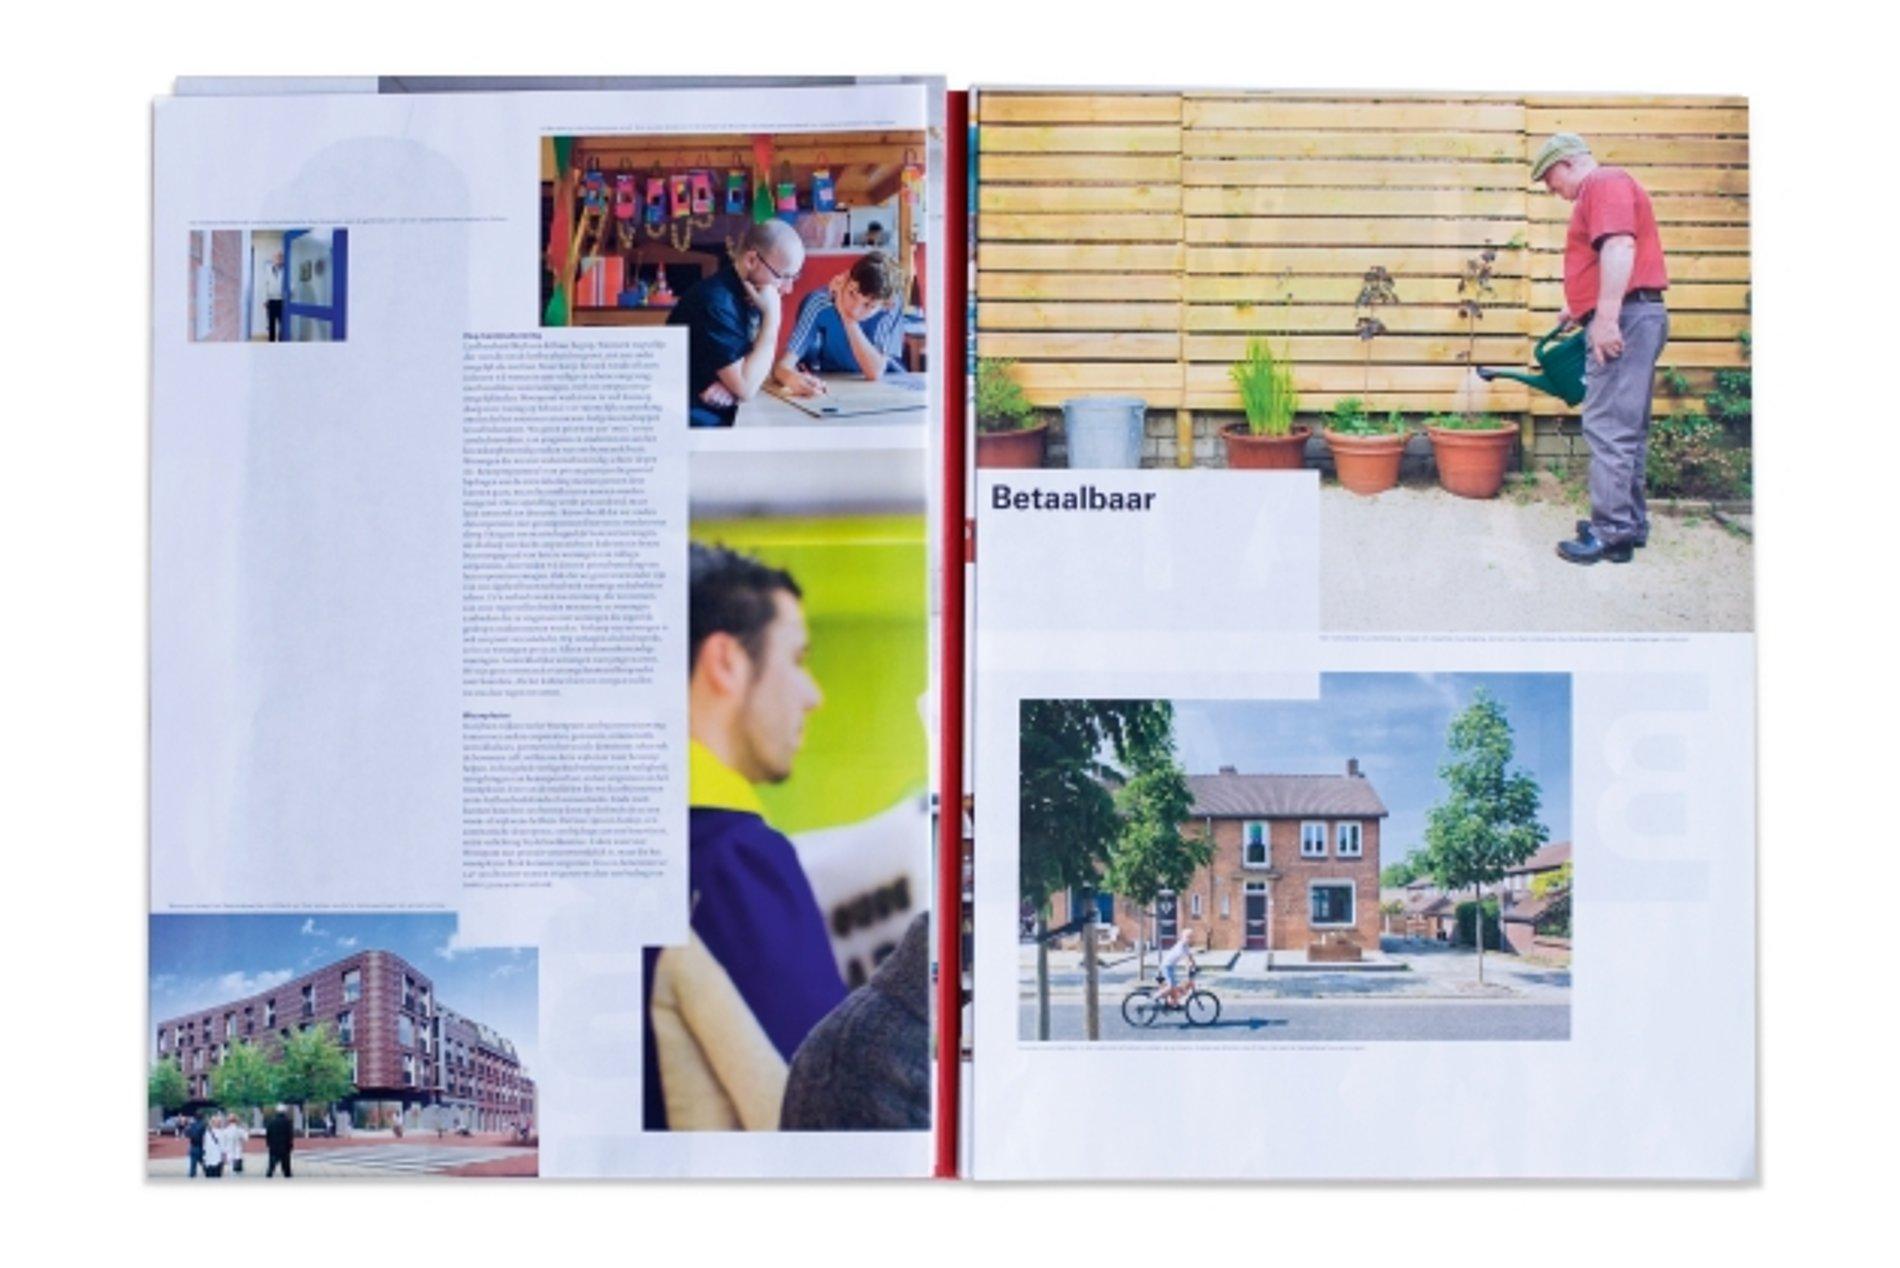 Woonpunt Annual Report 2010 | Red Dot Design Award